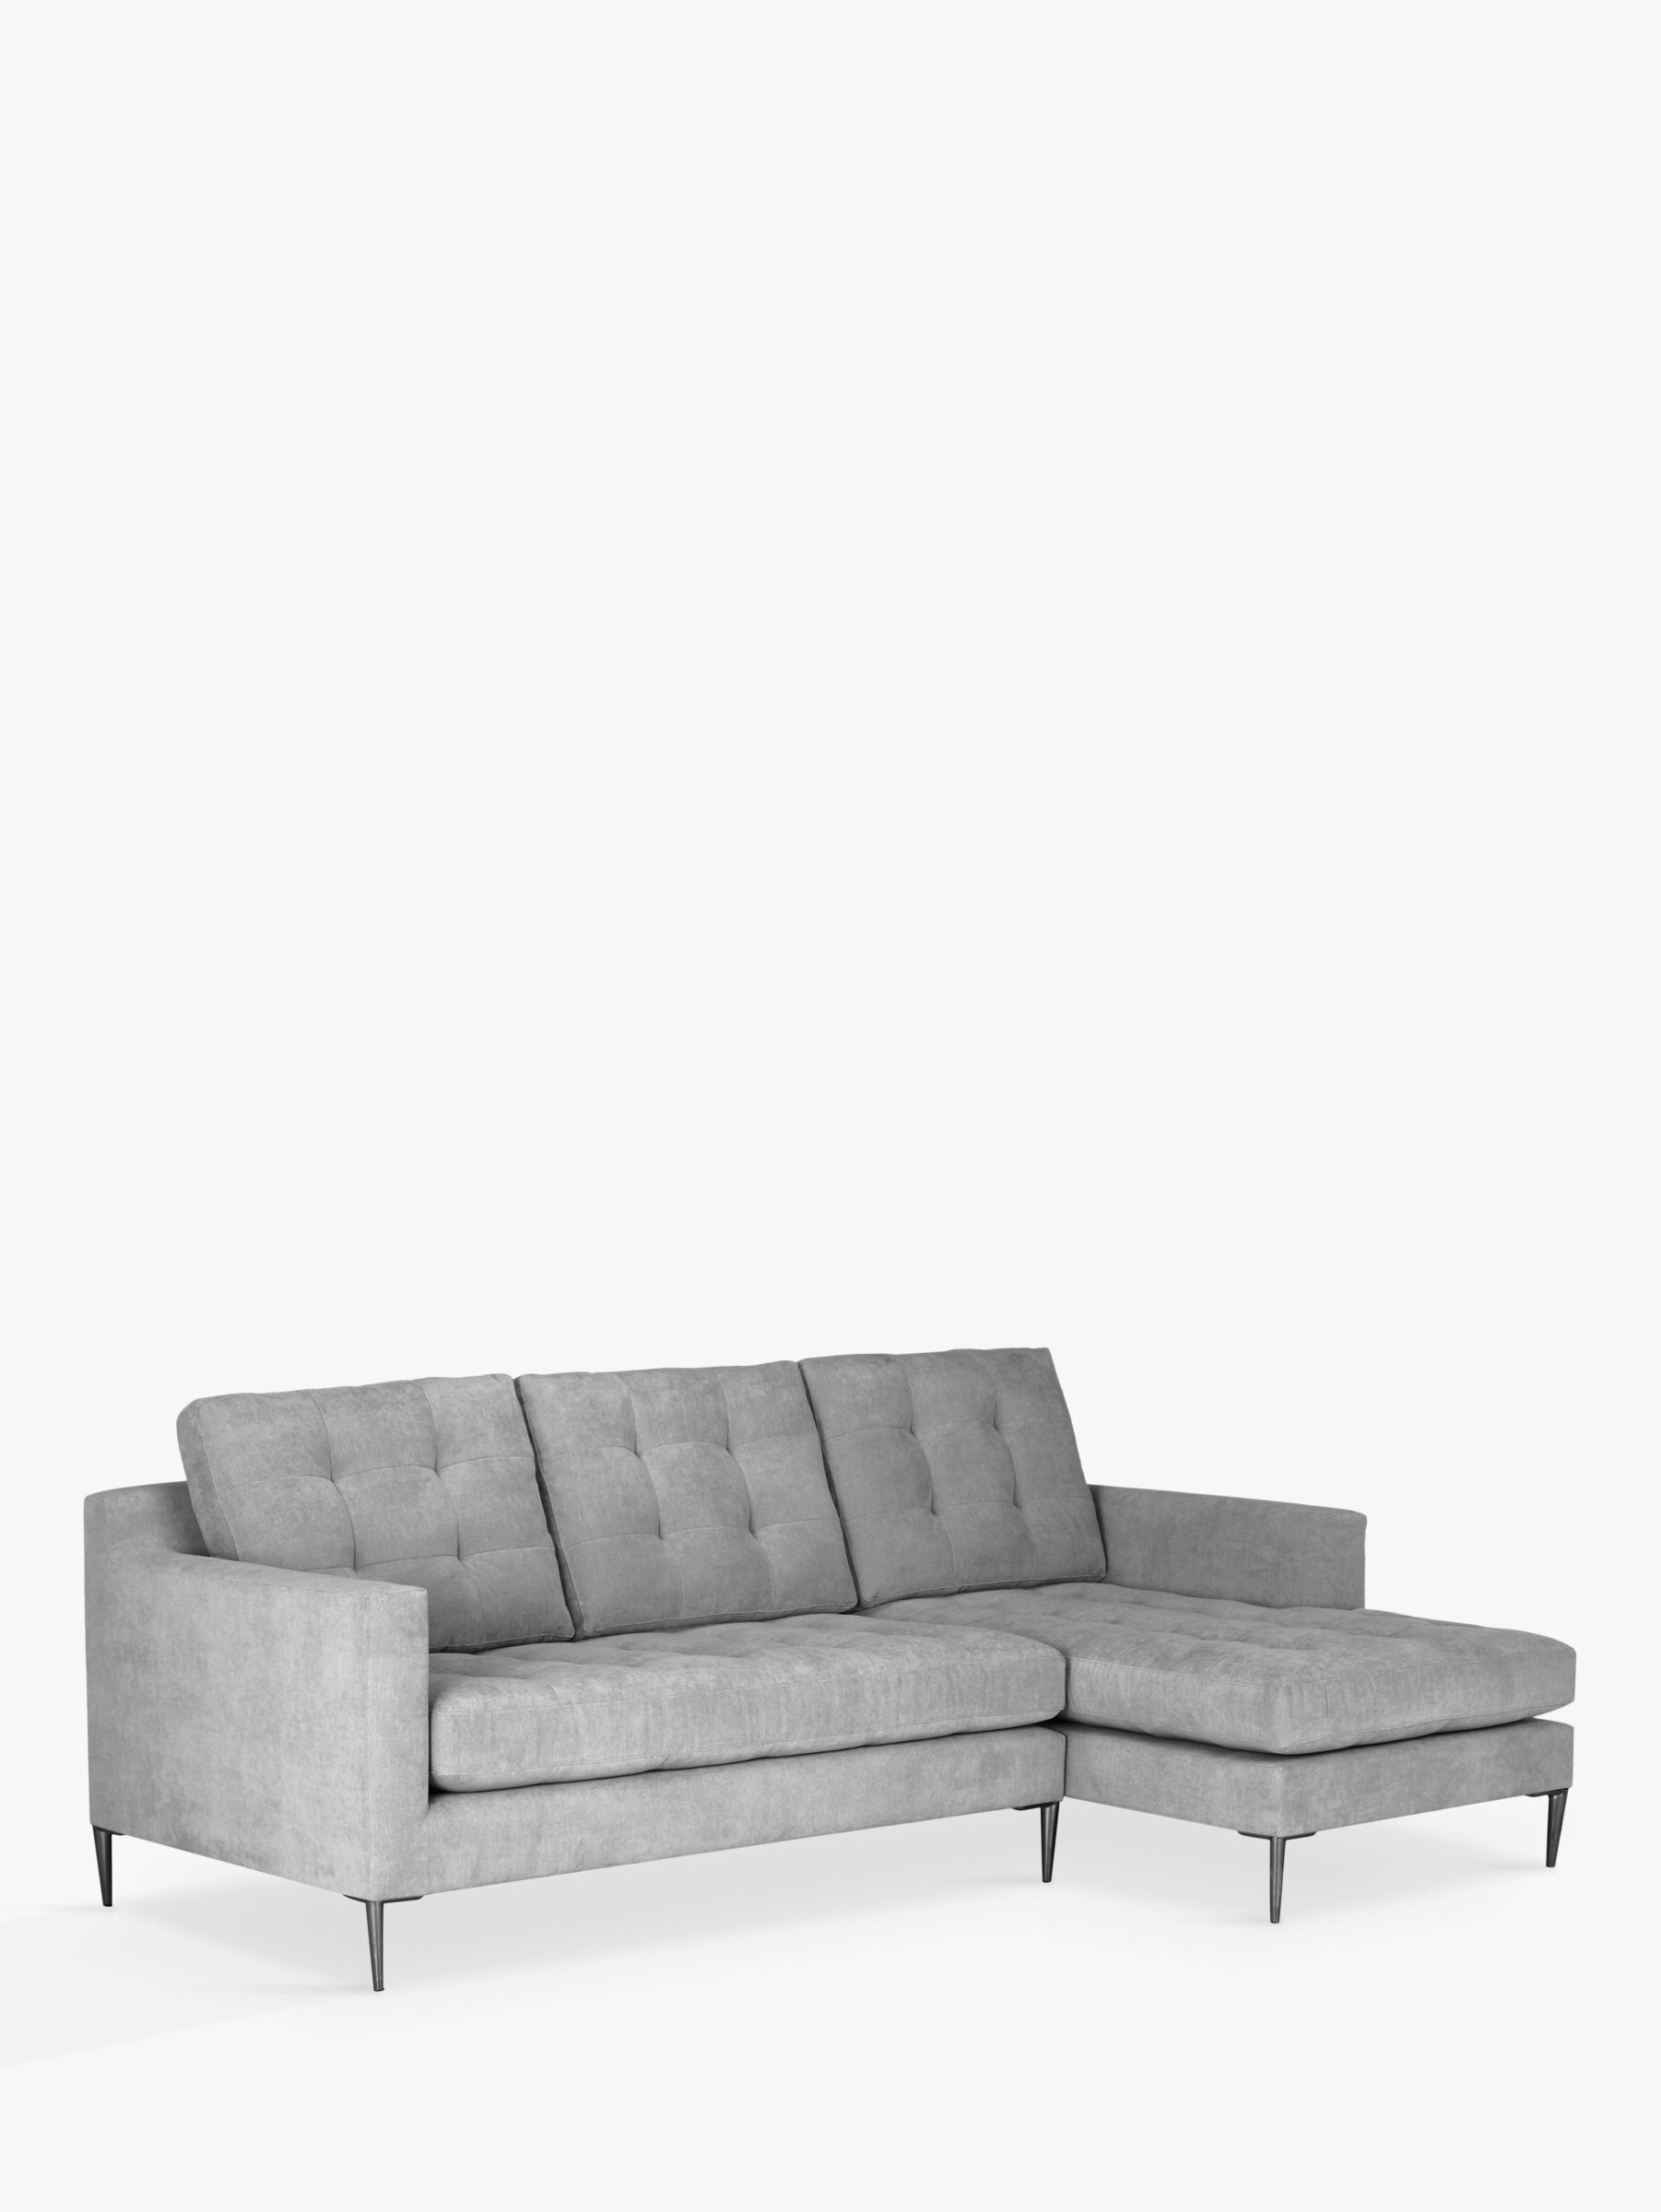 John Lewis Partners Draper Rhf Chaise End Sofa Metal Legs Metal Sofa Sofa Sofa Legs